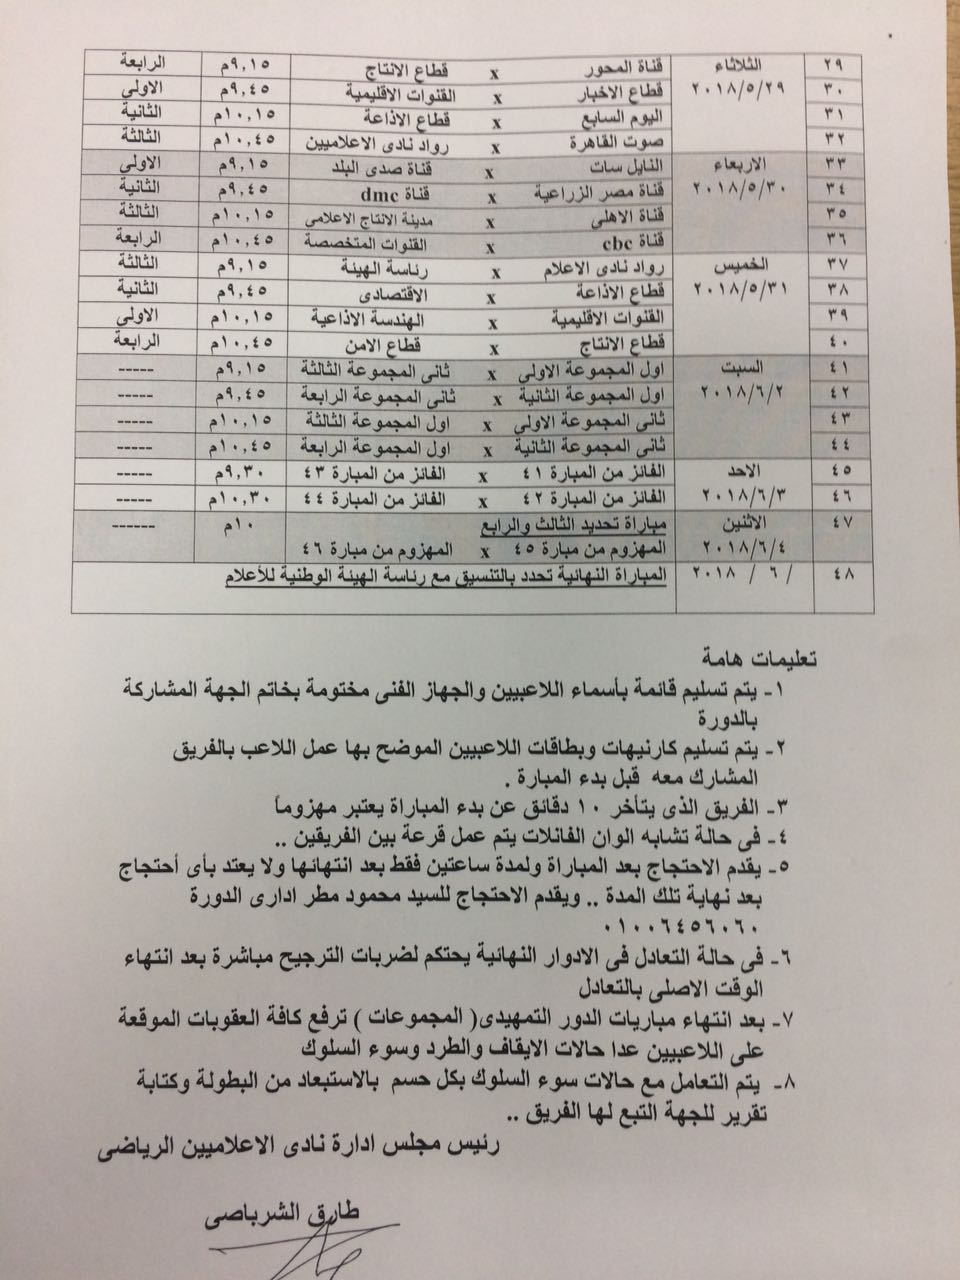 11ead27ac https://www.youm7.com/story/2018/5/16/حسام-حسن-راض-عن-التعادل-مع ...